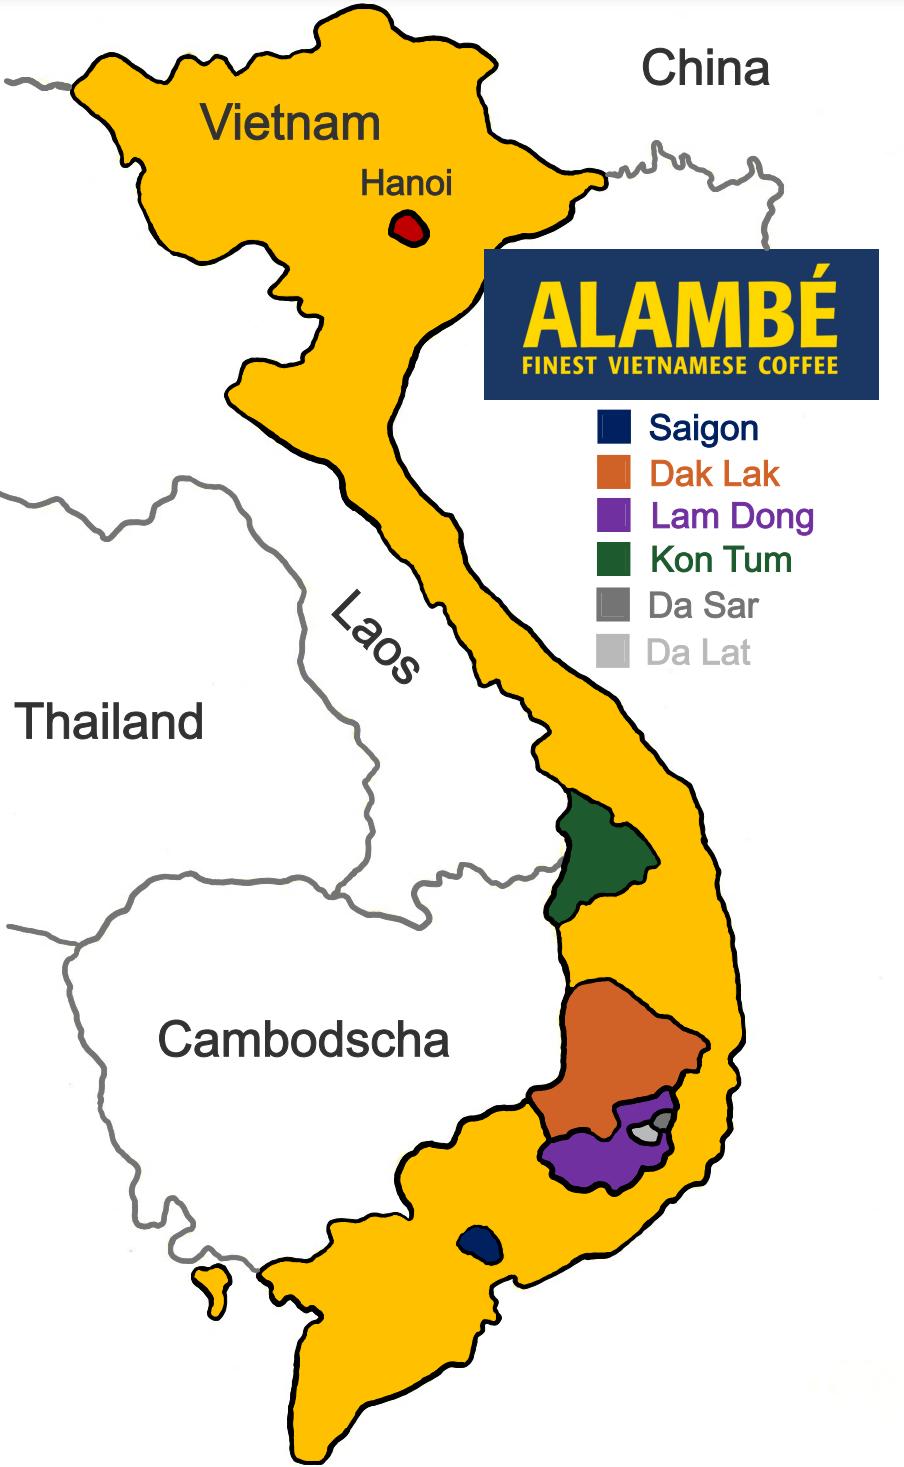 Vietnam Alambé Map